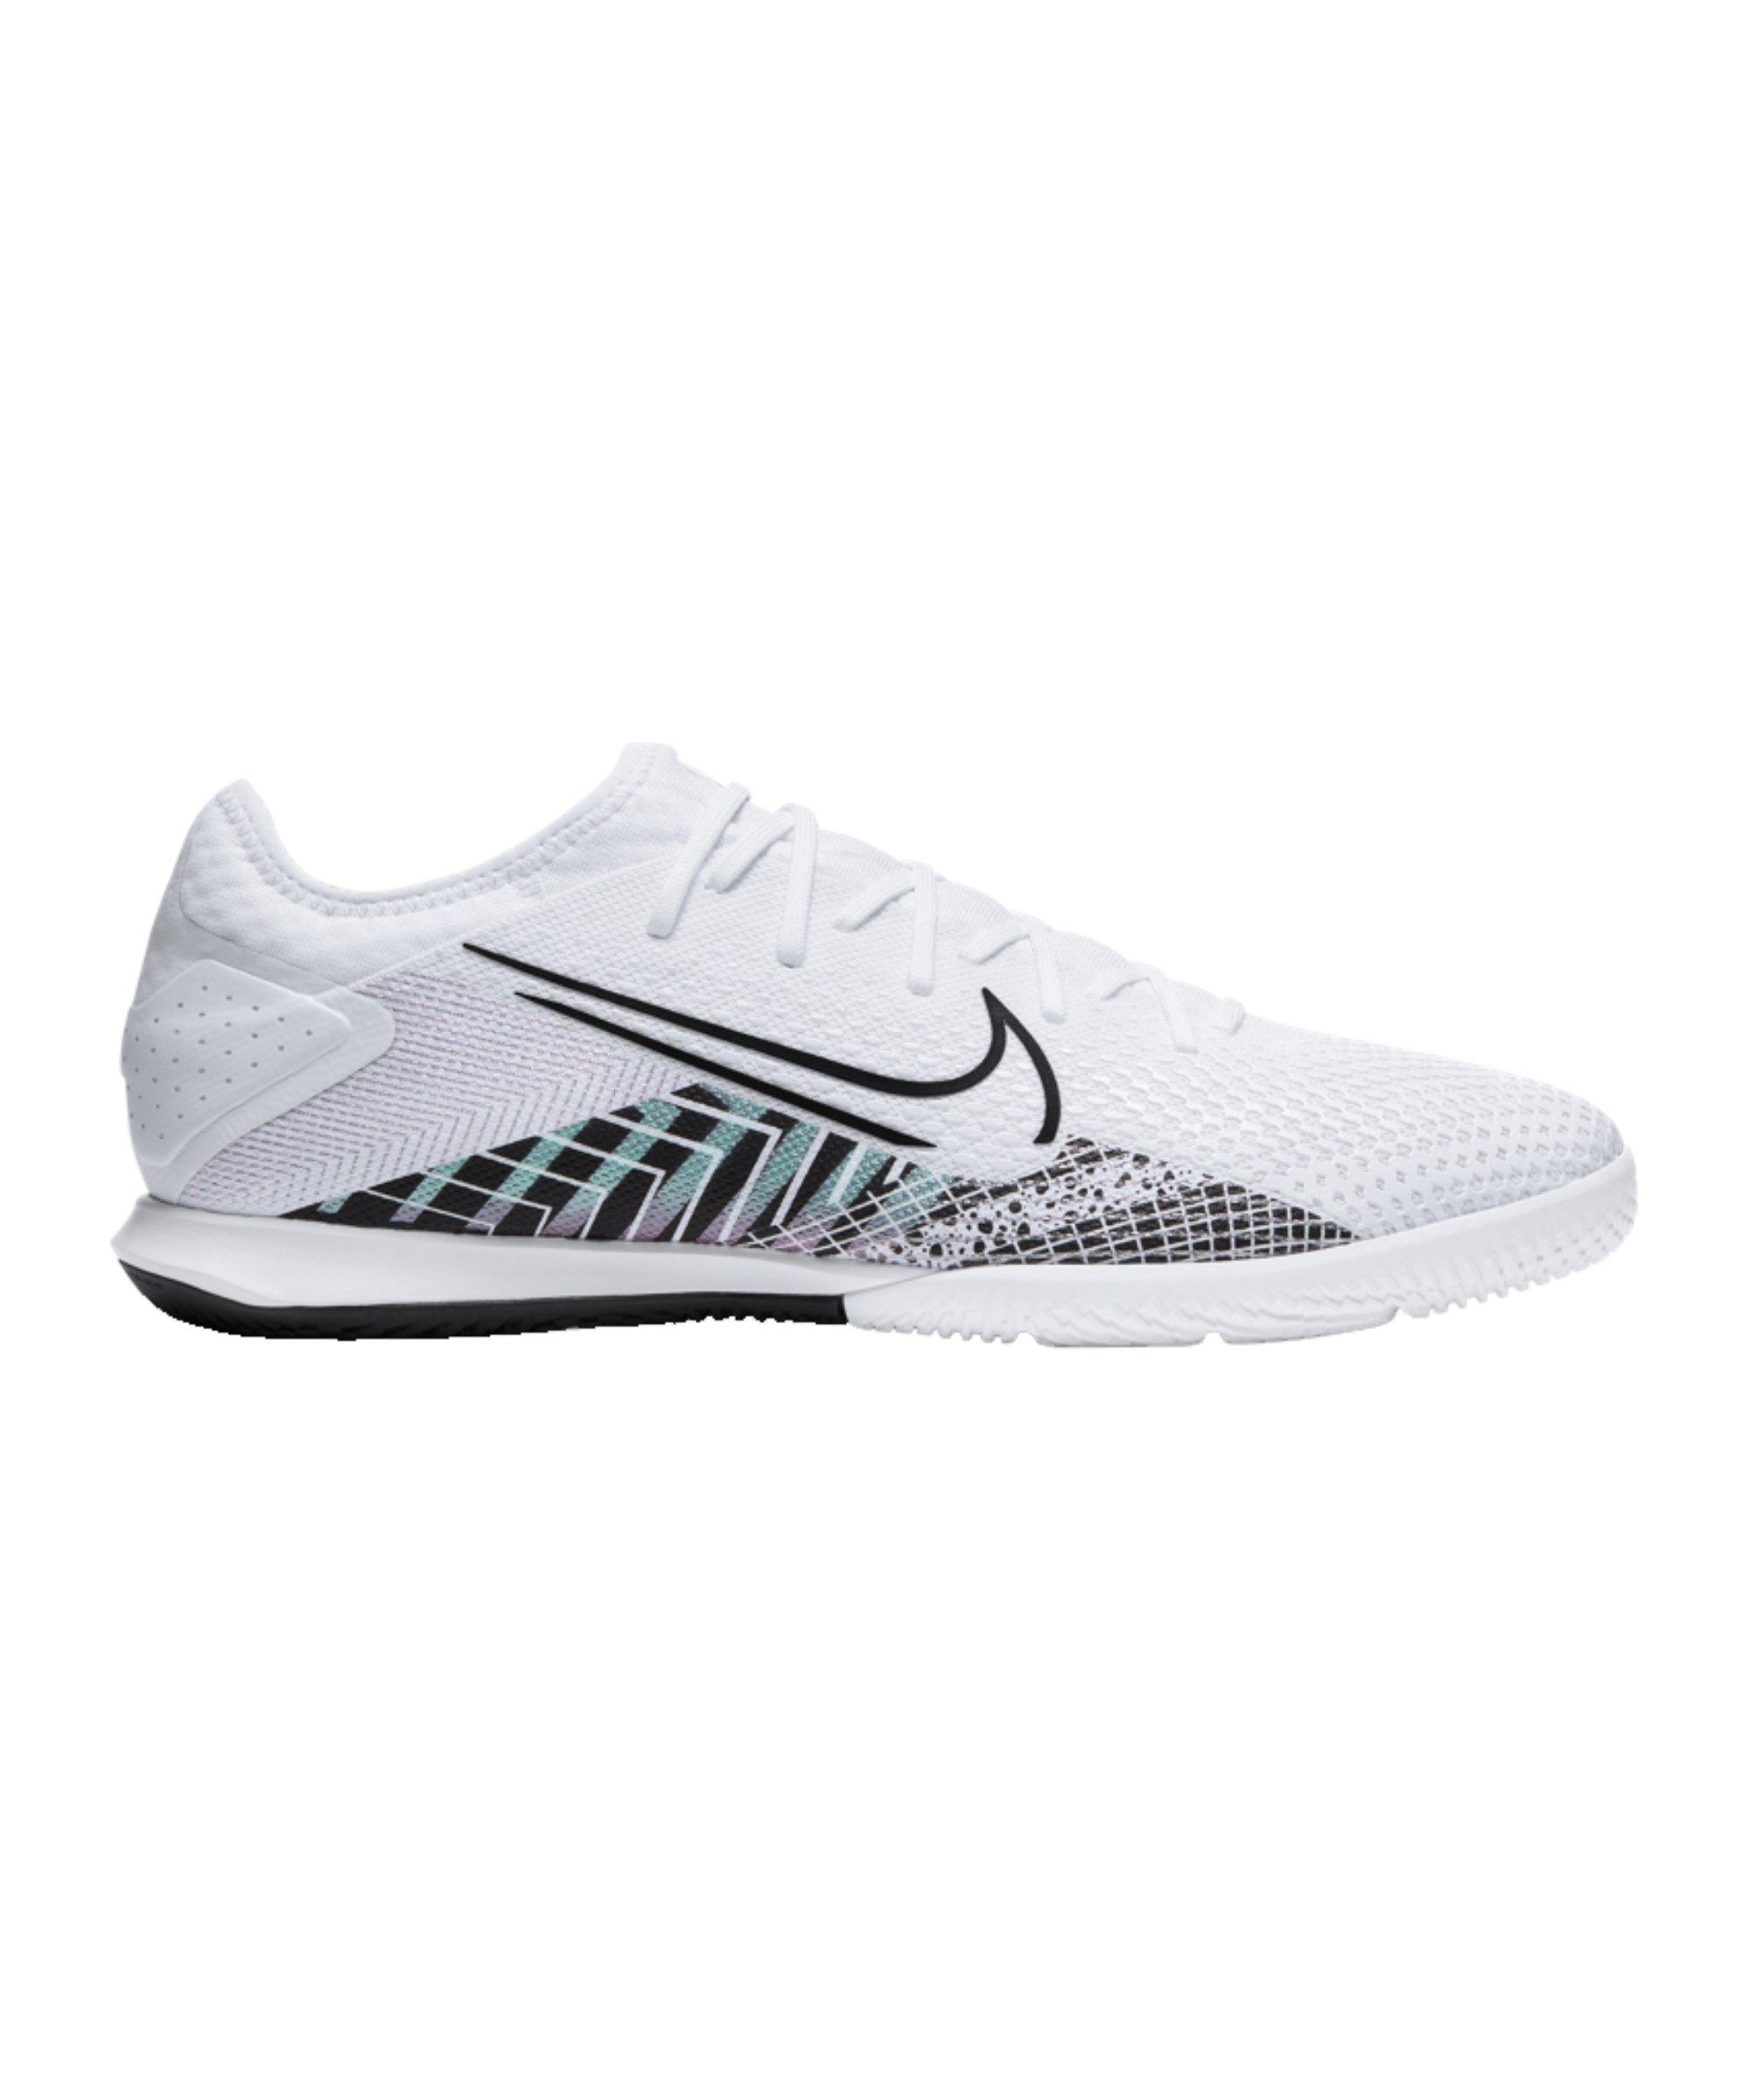 Nike Mercurial Vapor XIII Dream Speed 3 Pro IC Weiss F110 - weiss